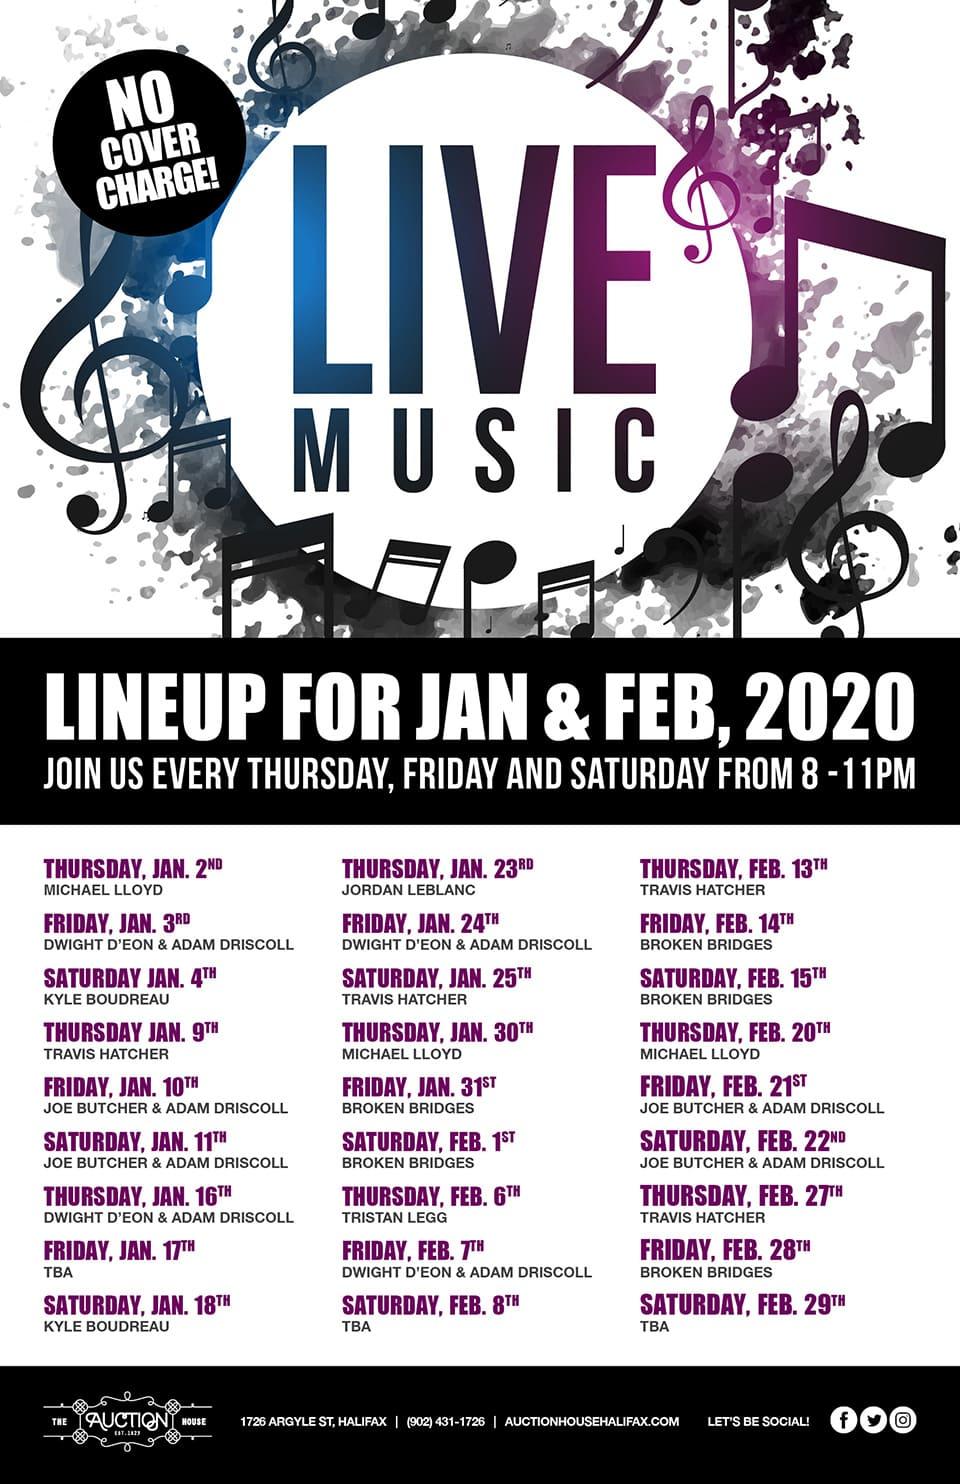 livemusic_auction-house_jan-feb-20